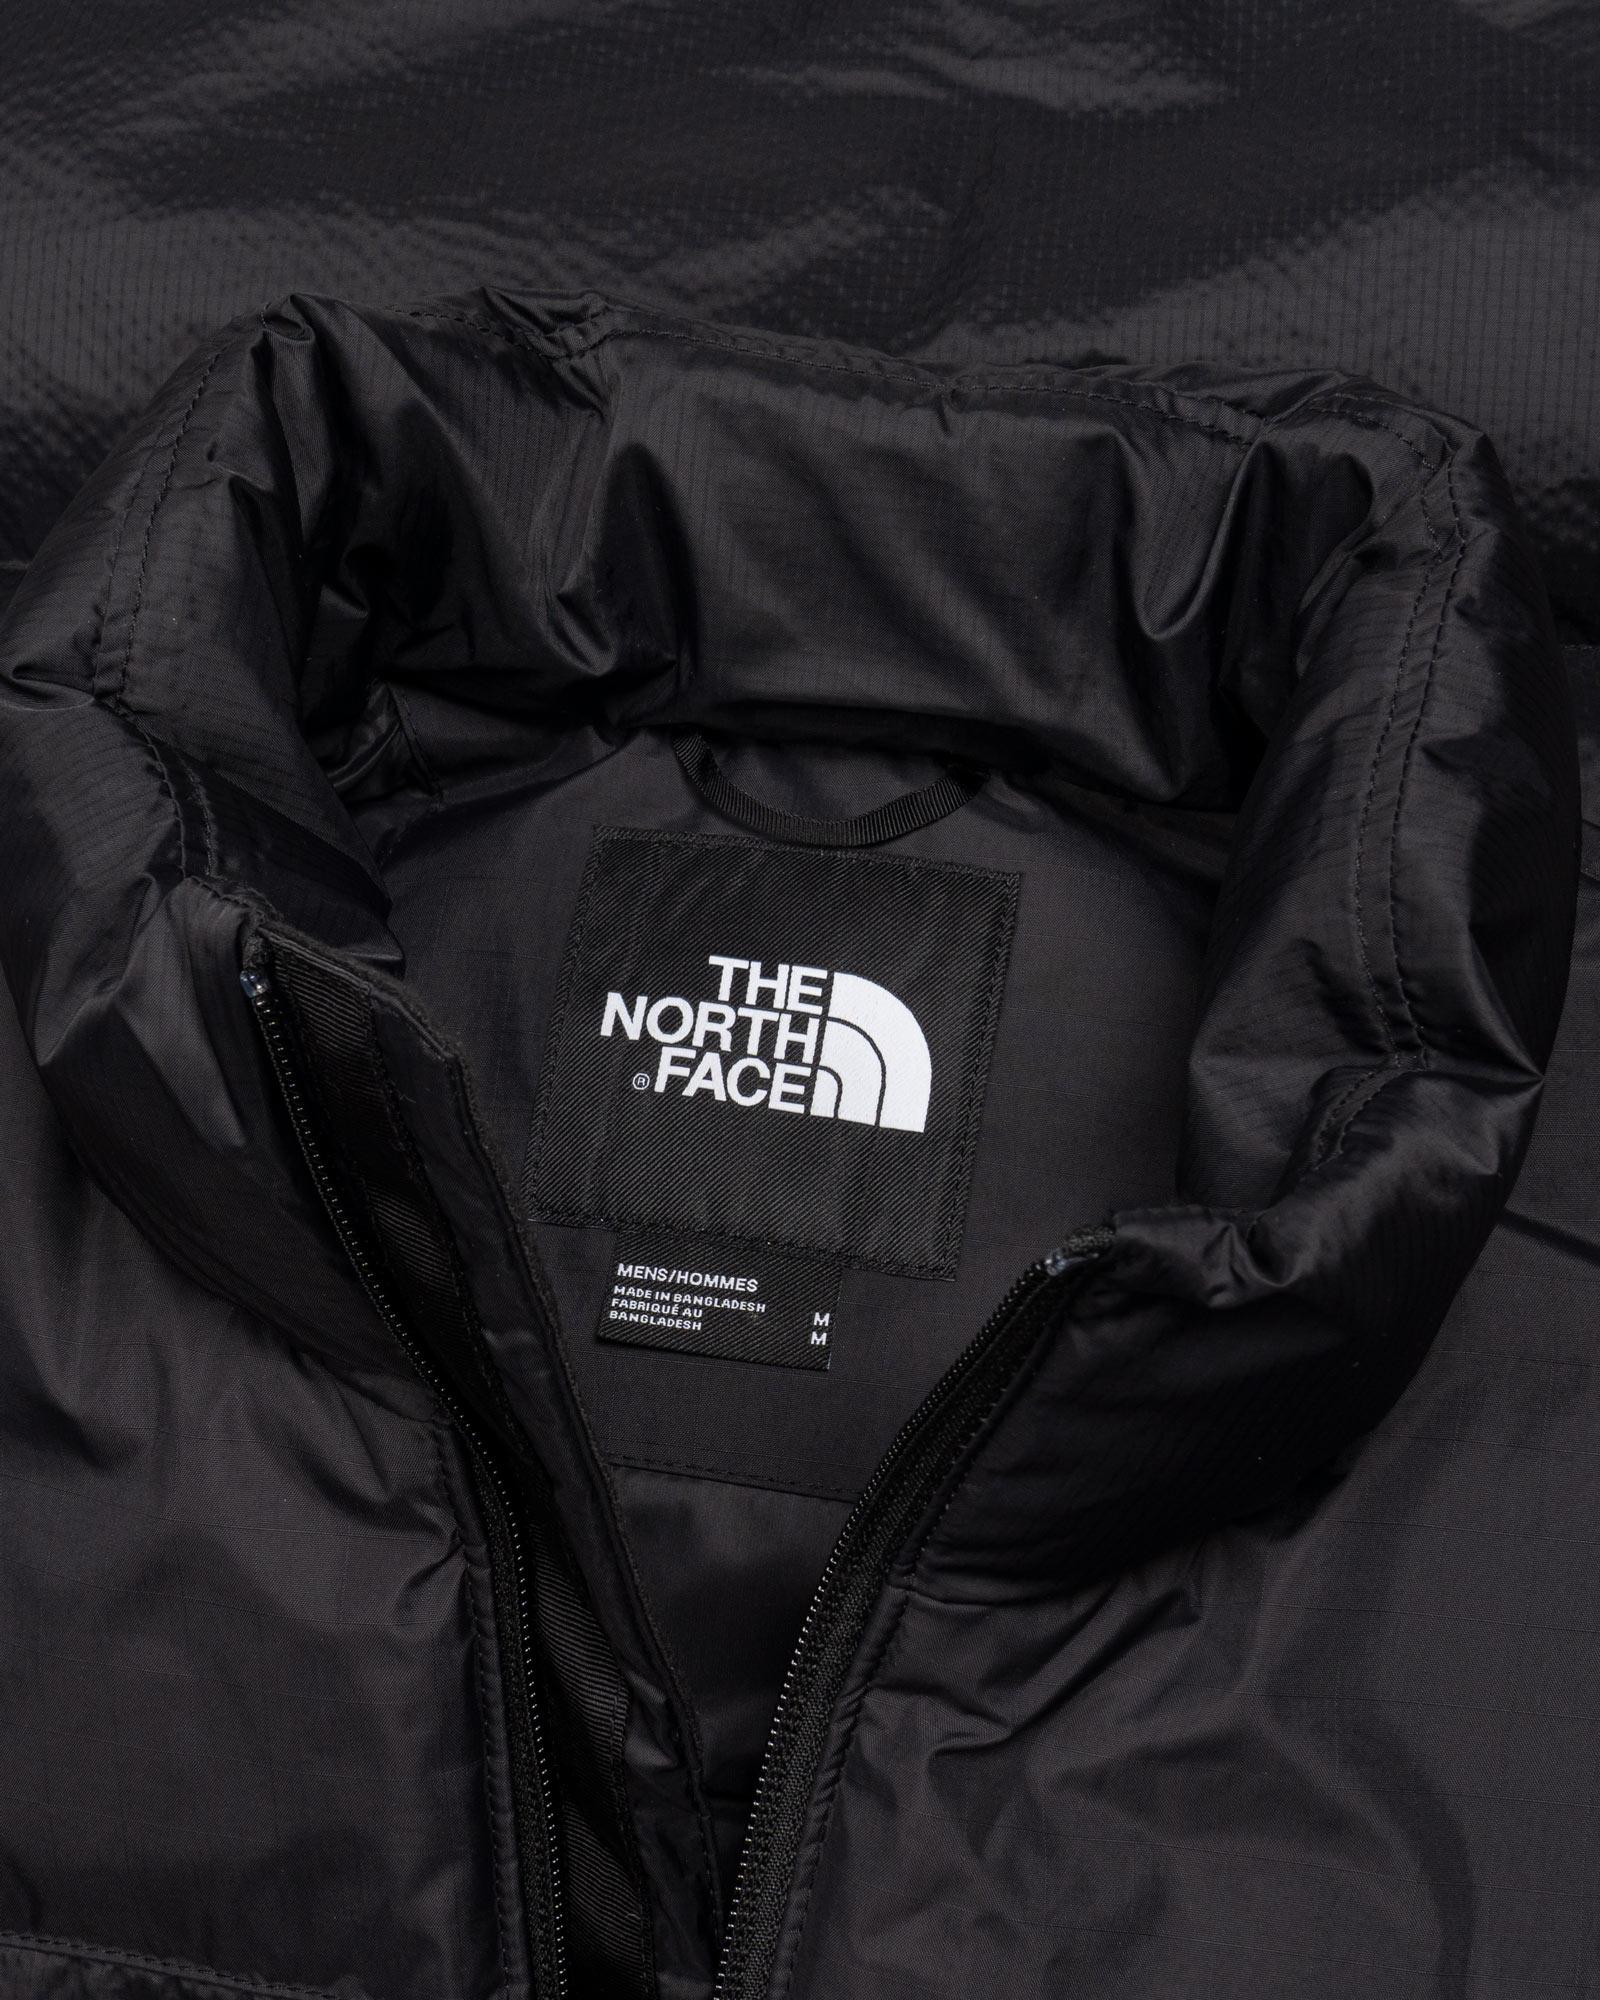 Мужской жилет Diablo Down Vest The North Face